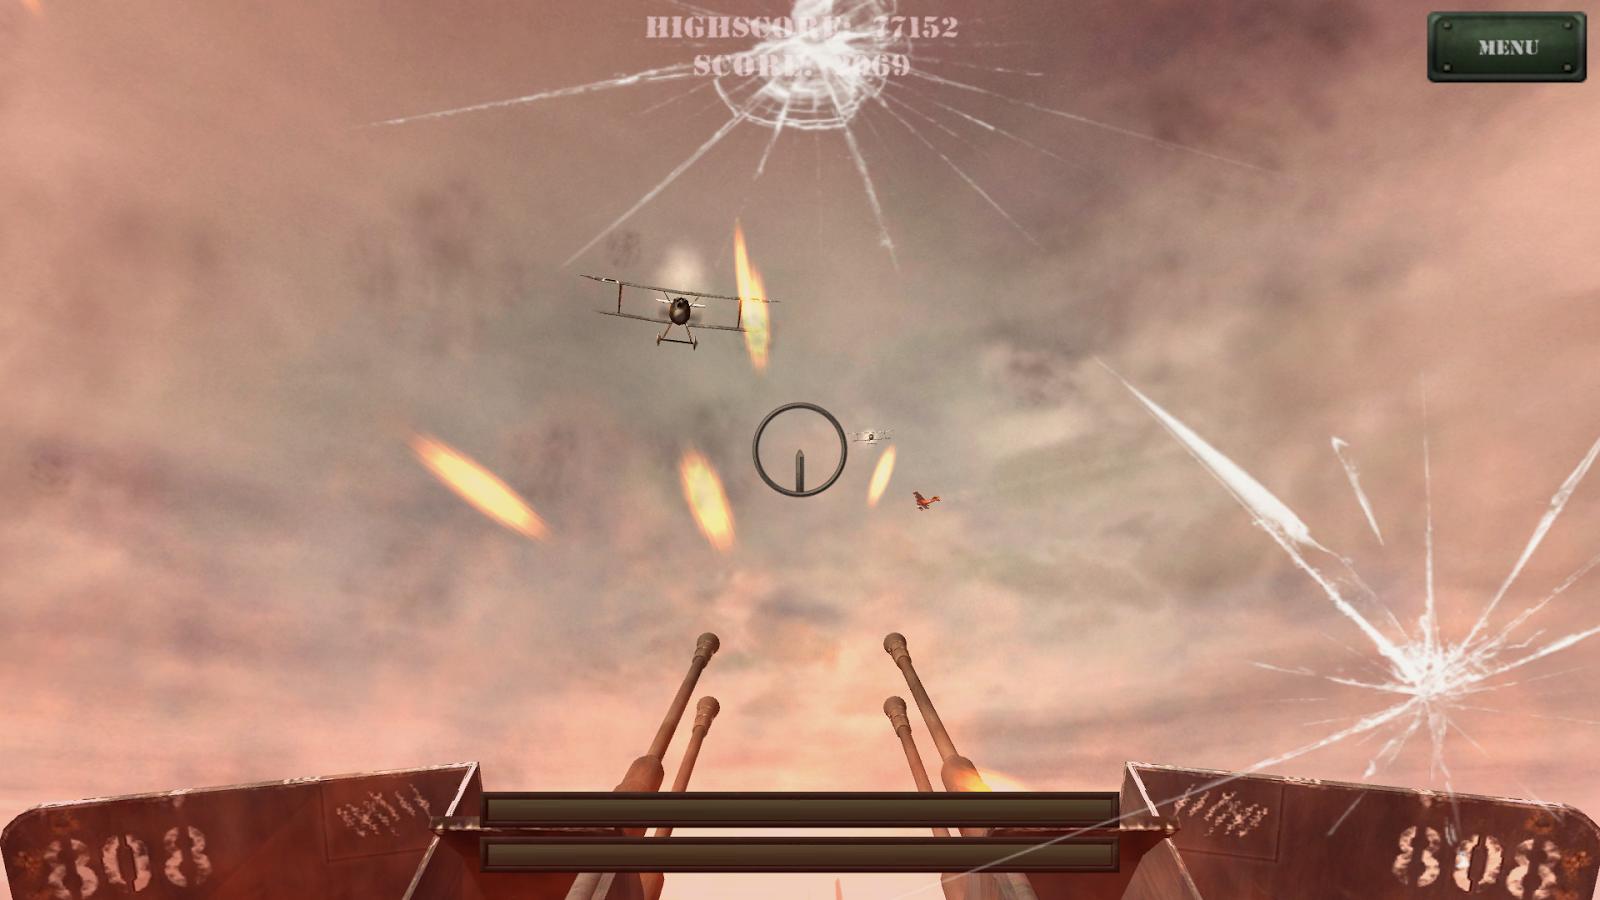 Shoot The Fokkers - screenshot